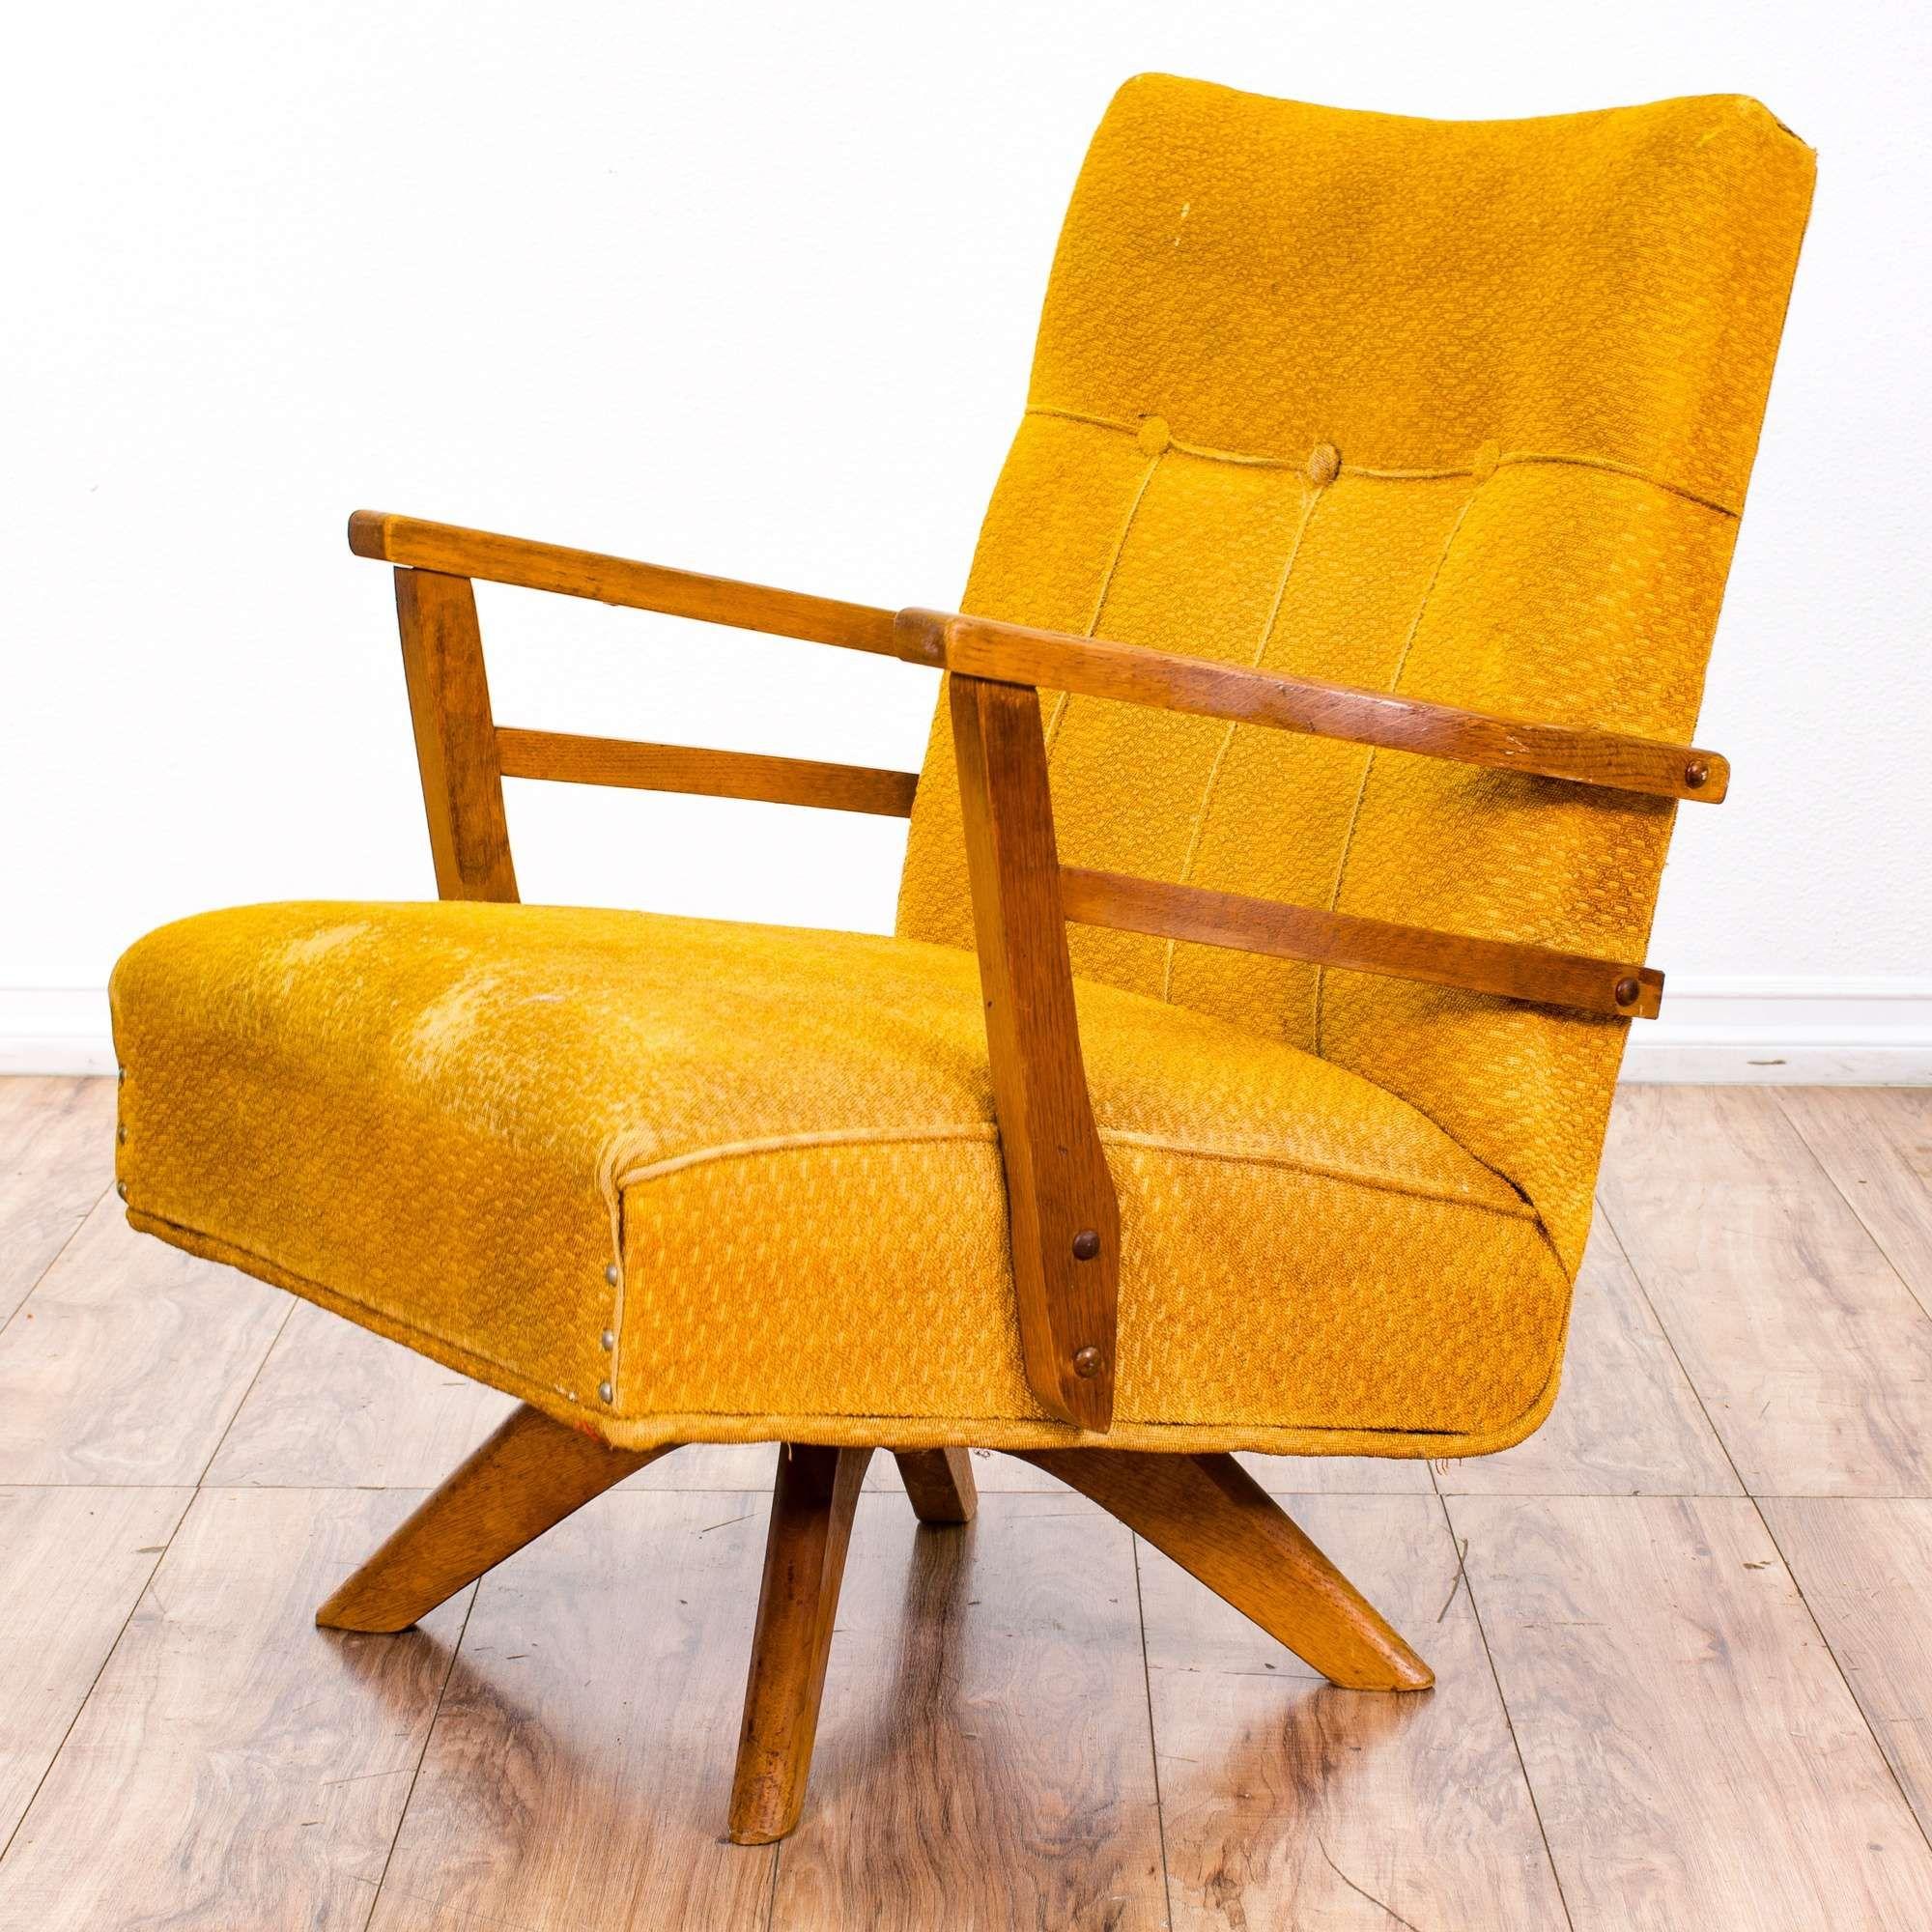 Astonishing Mid Century Modern Yellow Swivel Rocking Chair Loveseat Machost Co Dining Chair Design Ideas Machostcouk